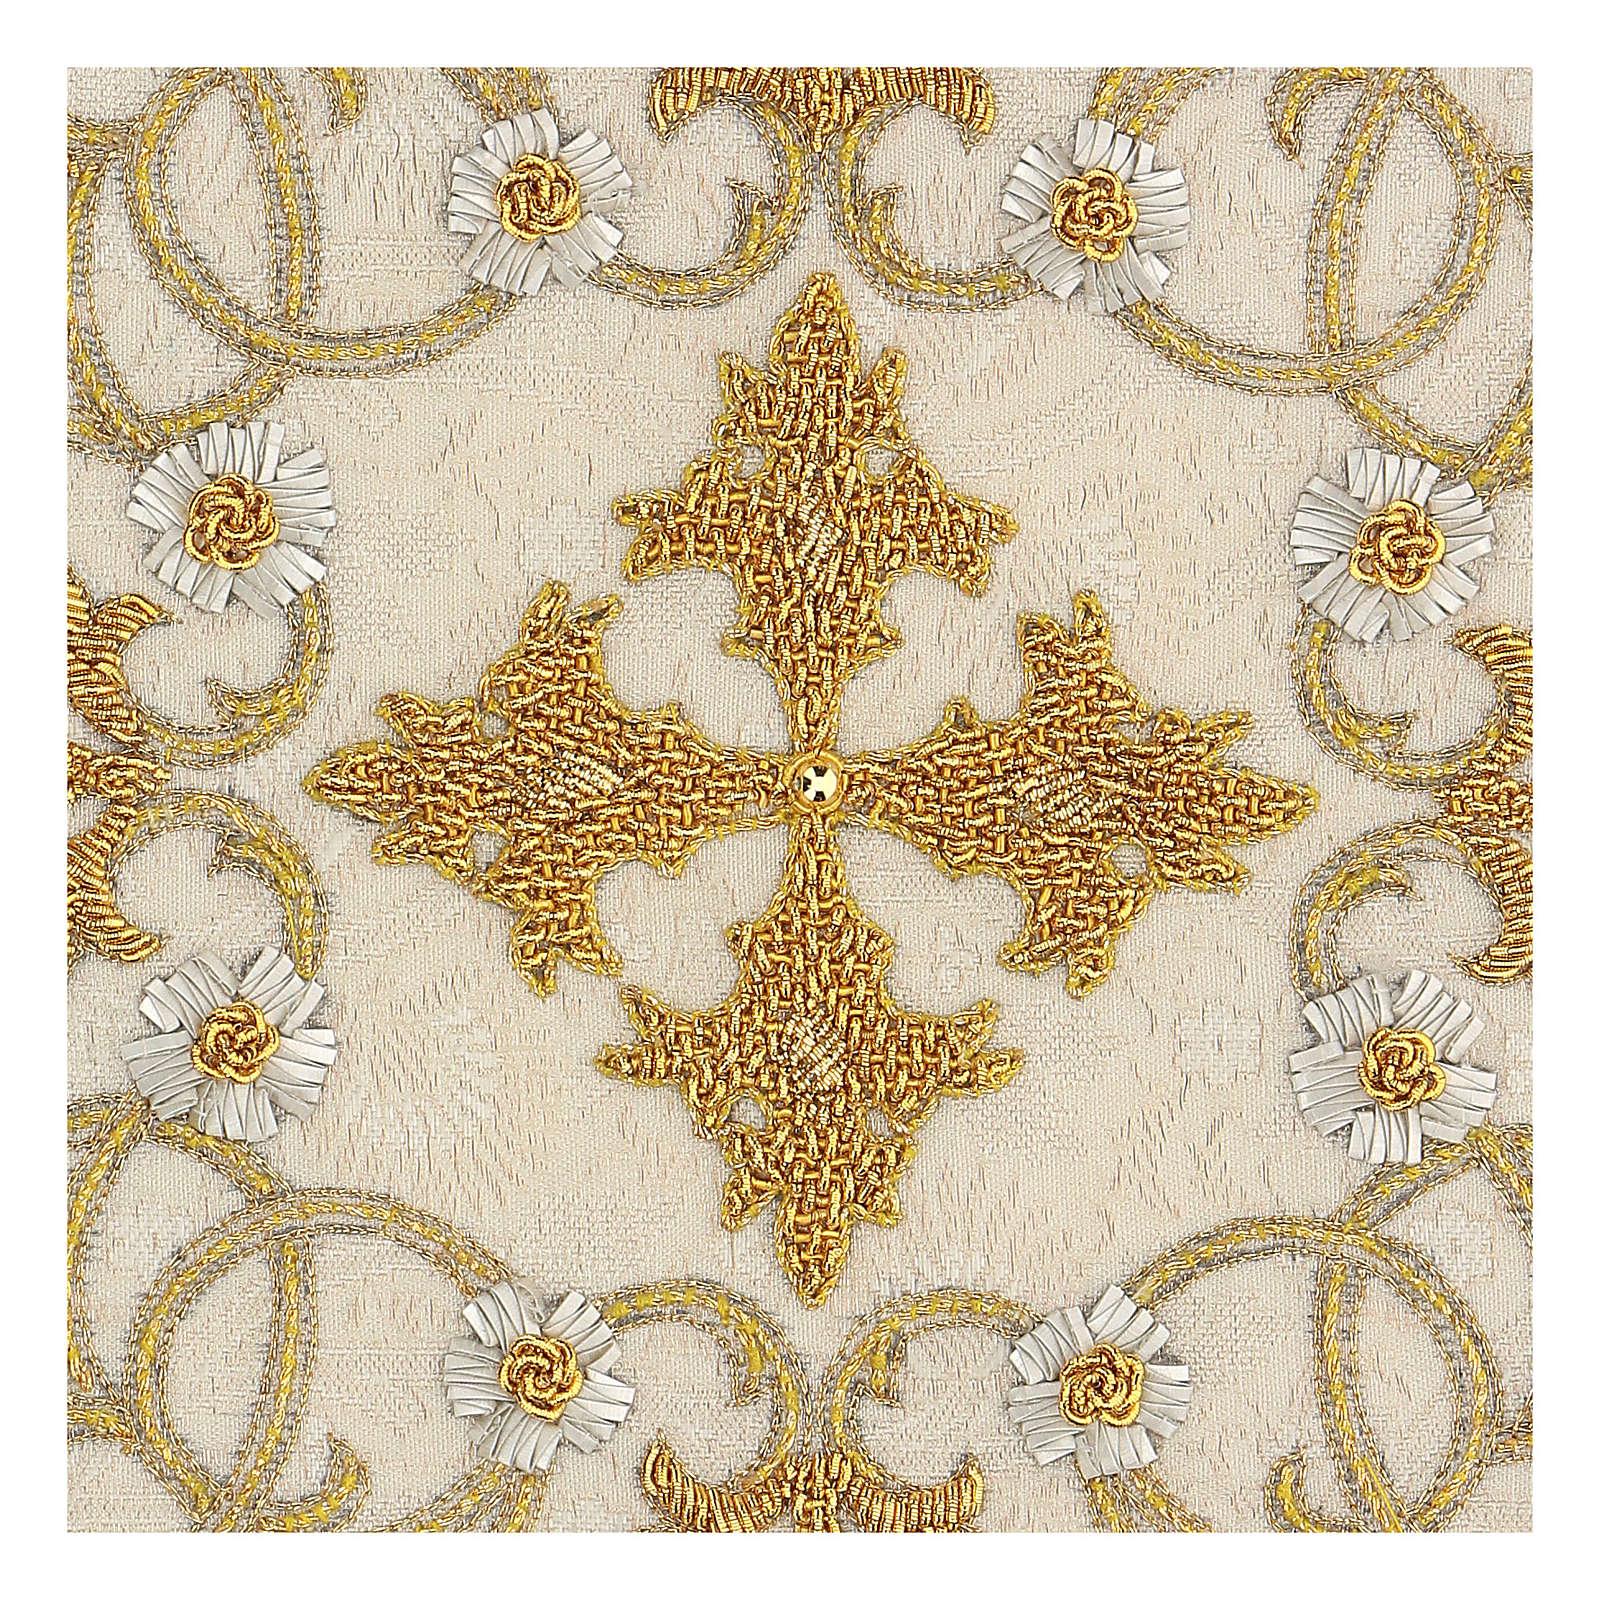 Chalice Cover Damask (Pall) handmade 4